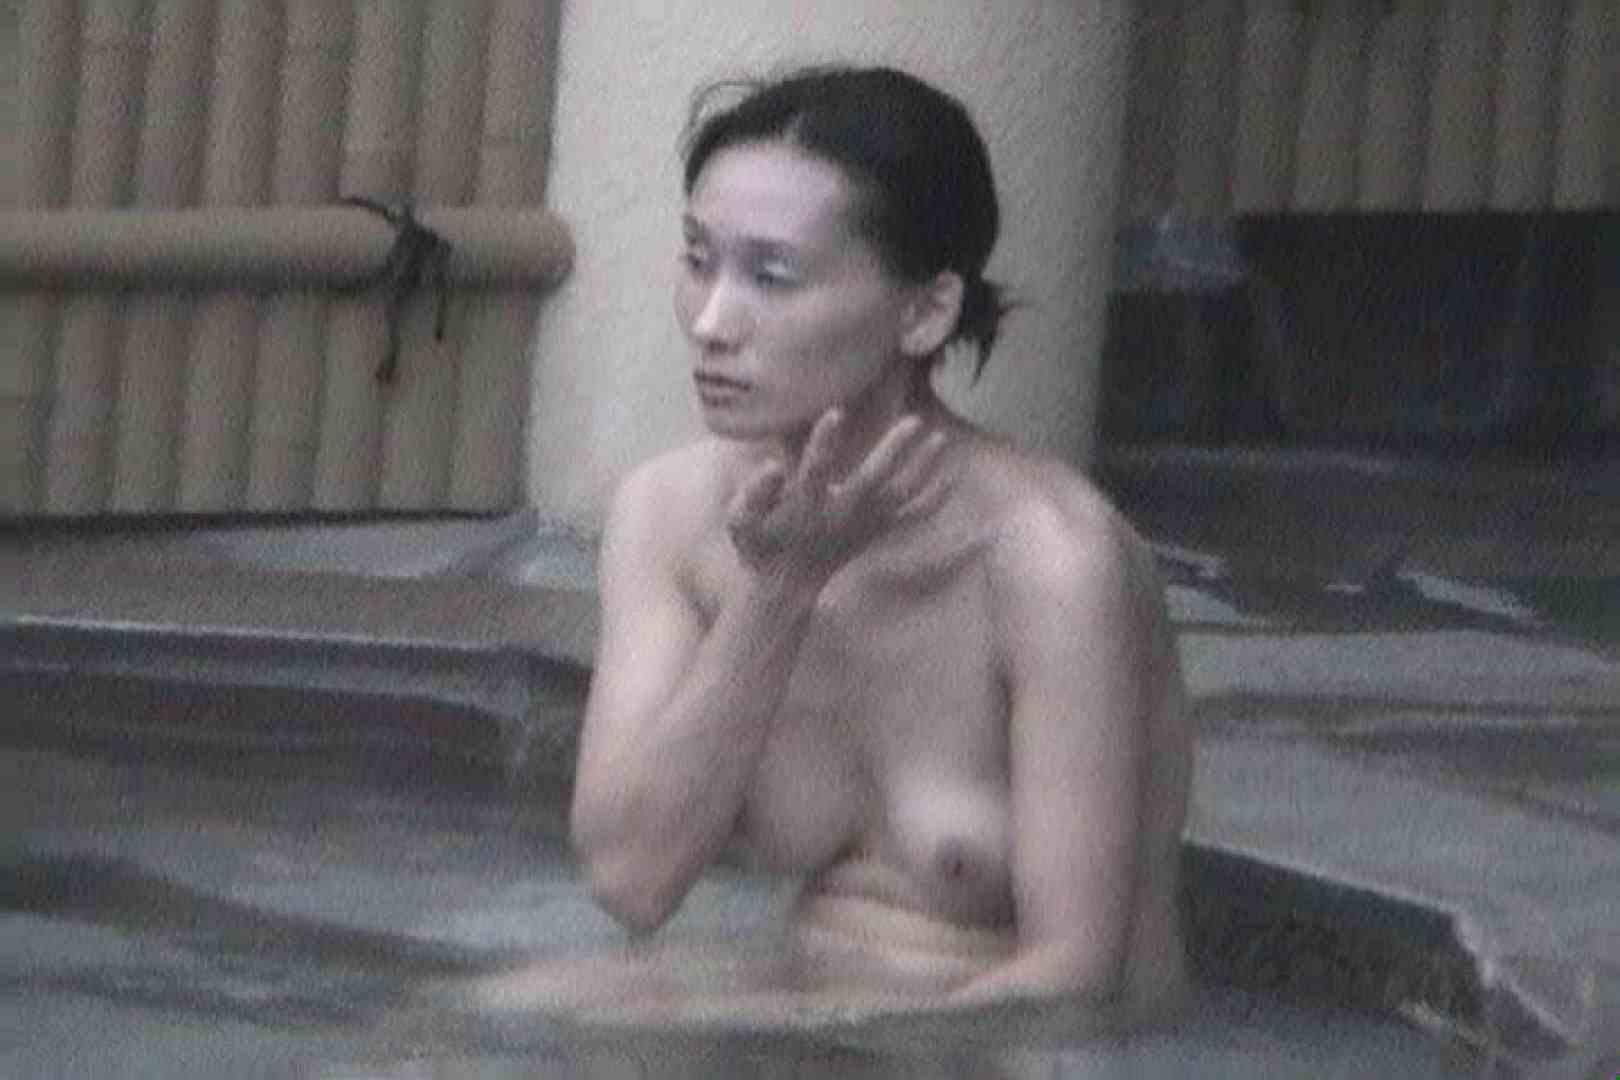 Aquaな露天風呂Vol.557 露天風呂編  100PIX 96